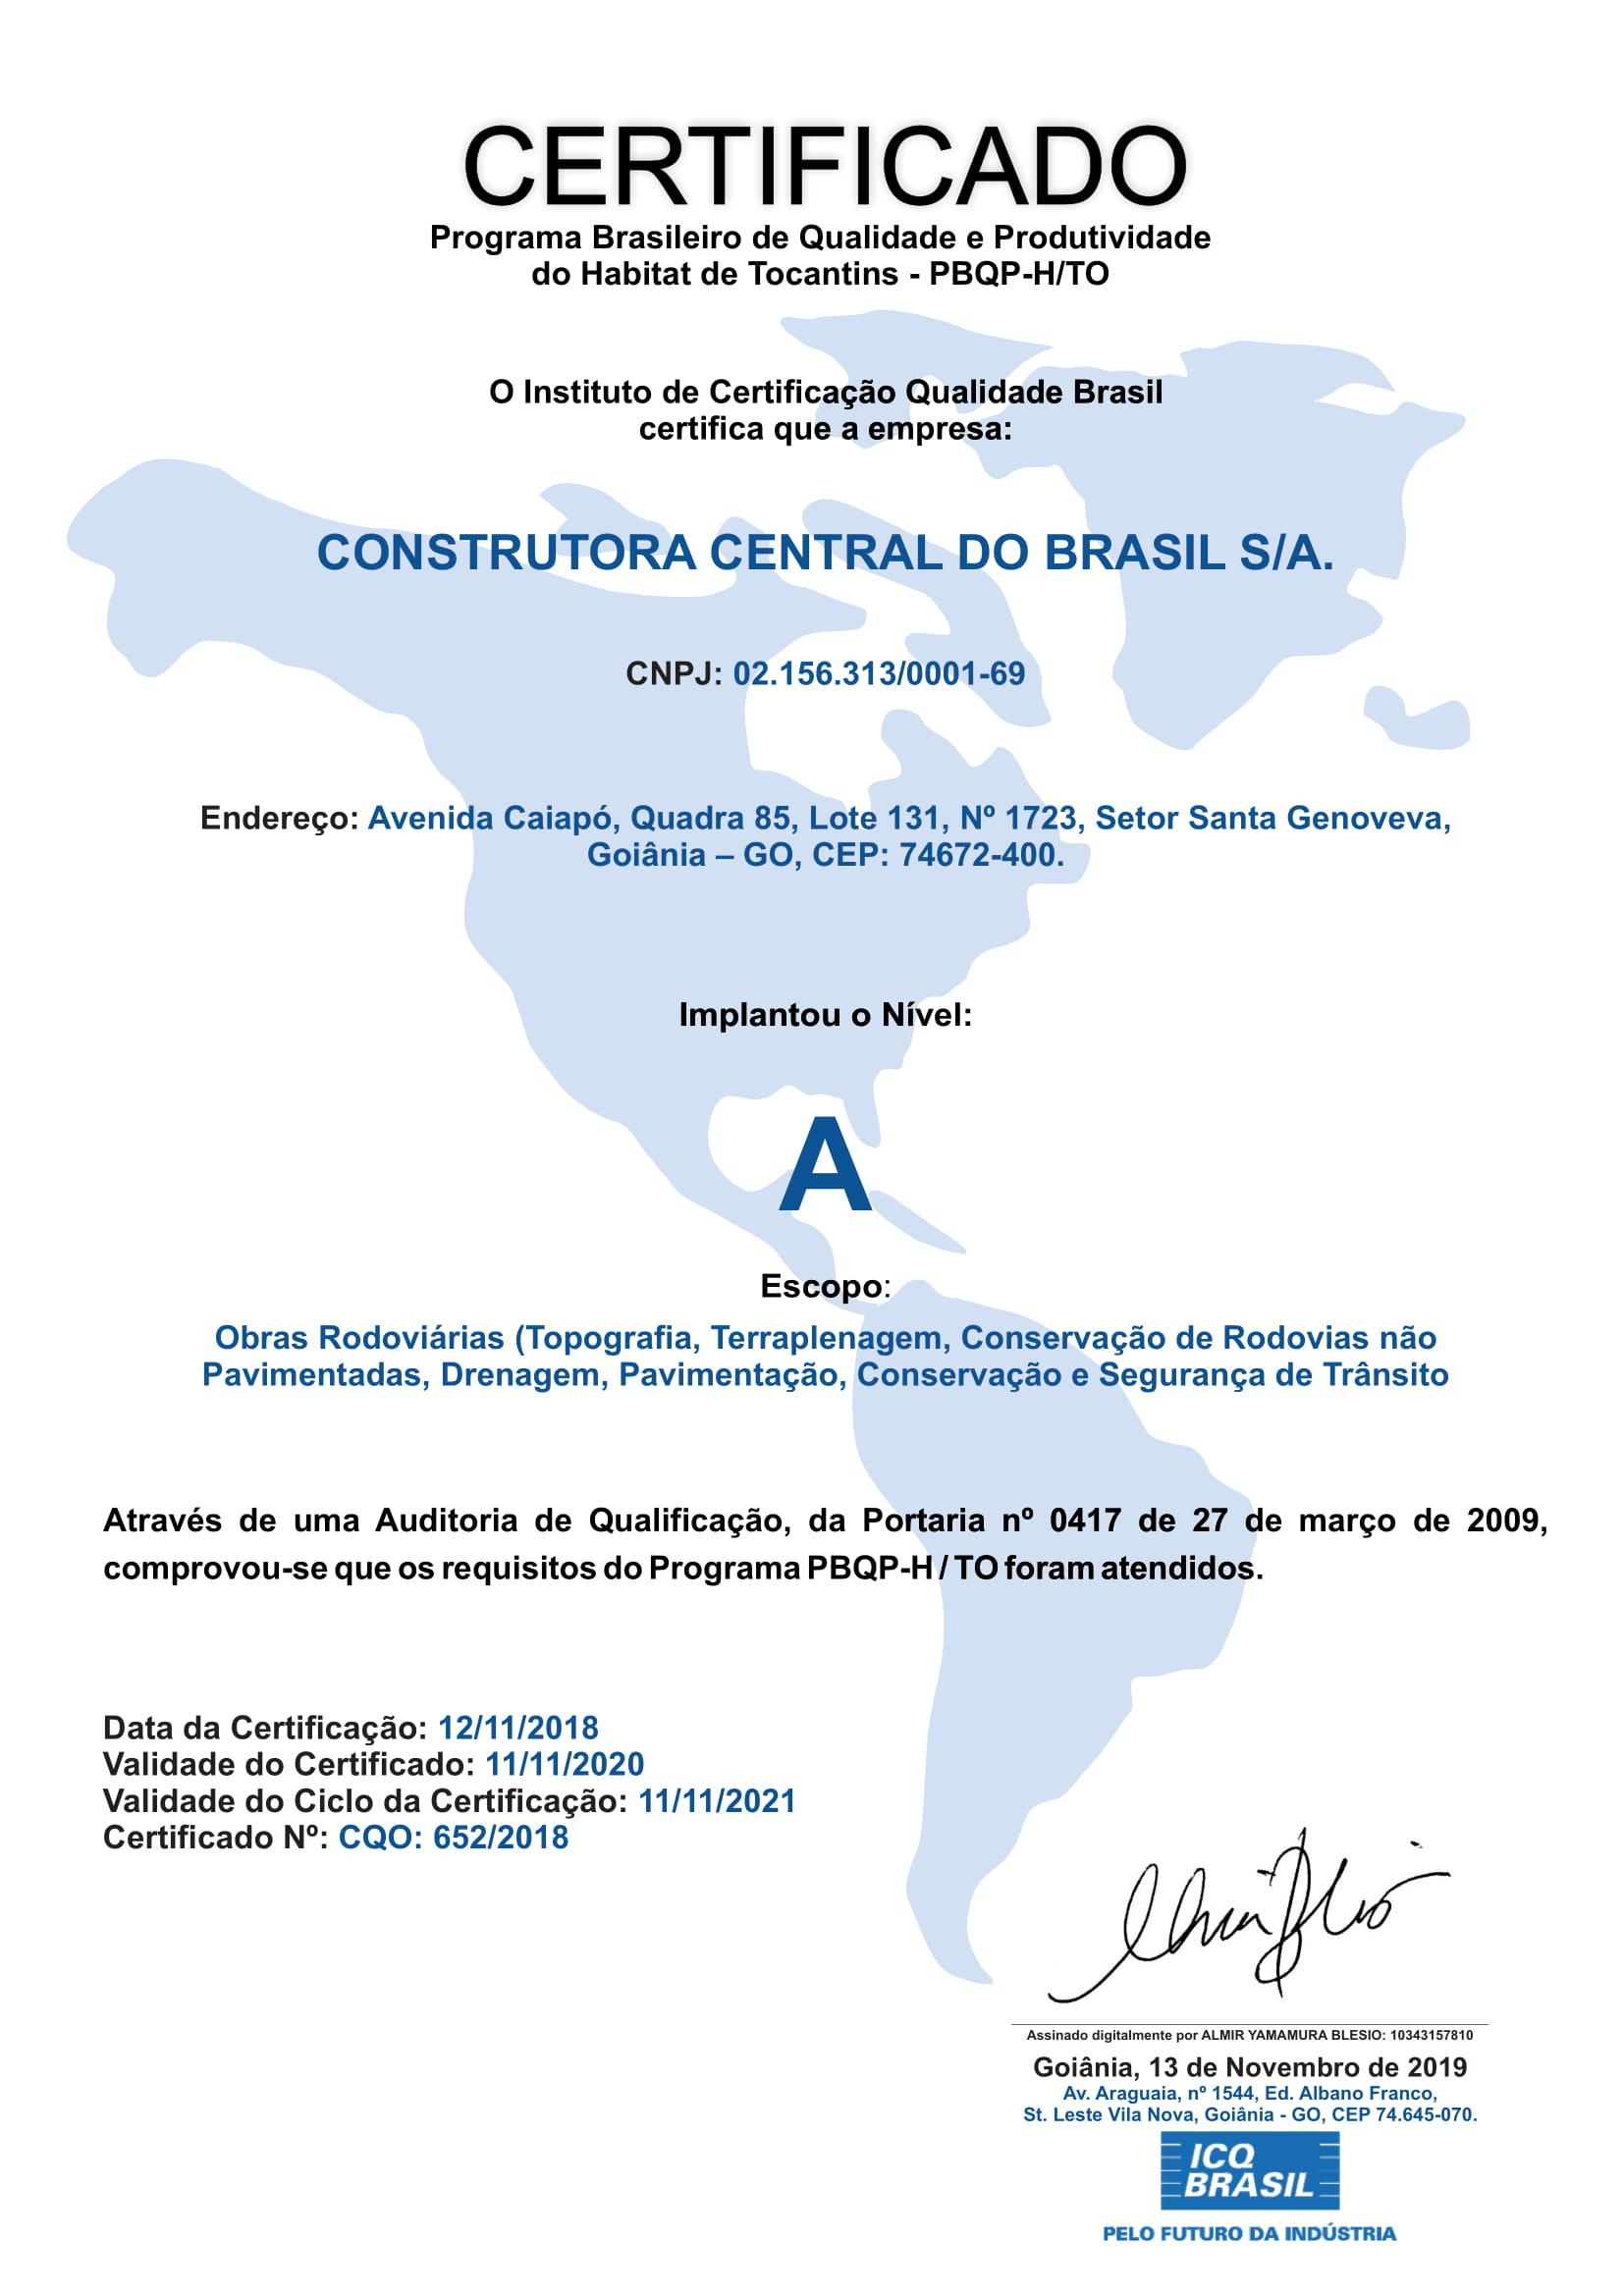 CERTIFICADO-DE-CONFORMIDADE-PBQP-H-TO-1